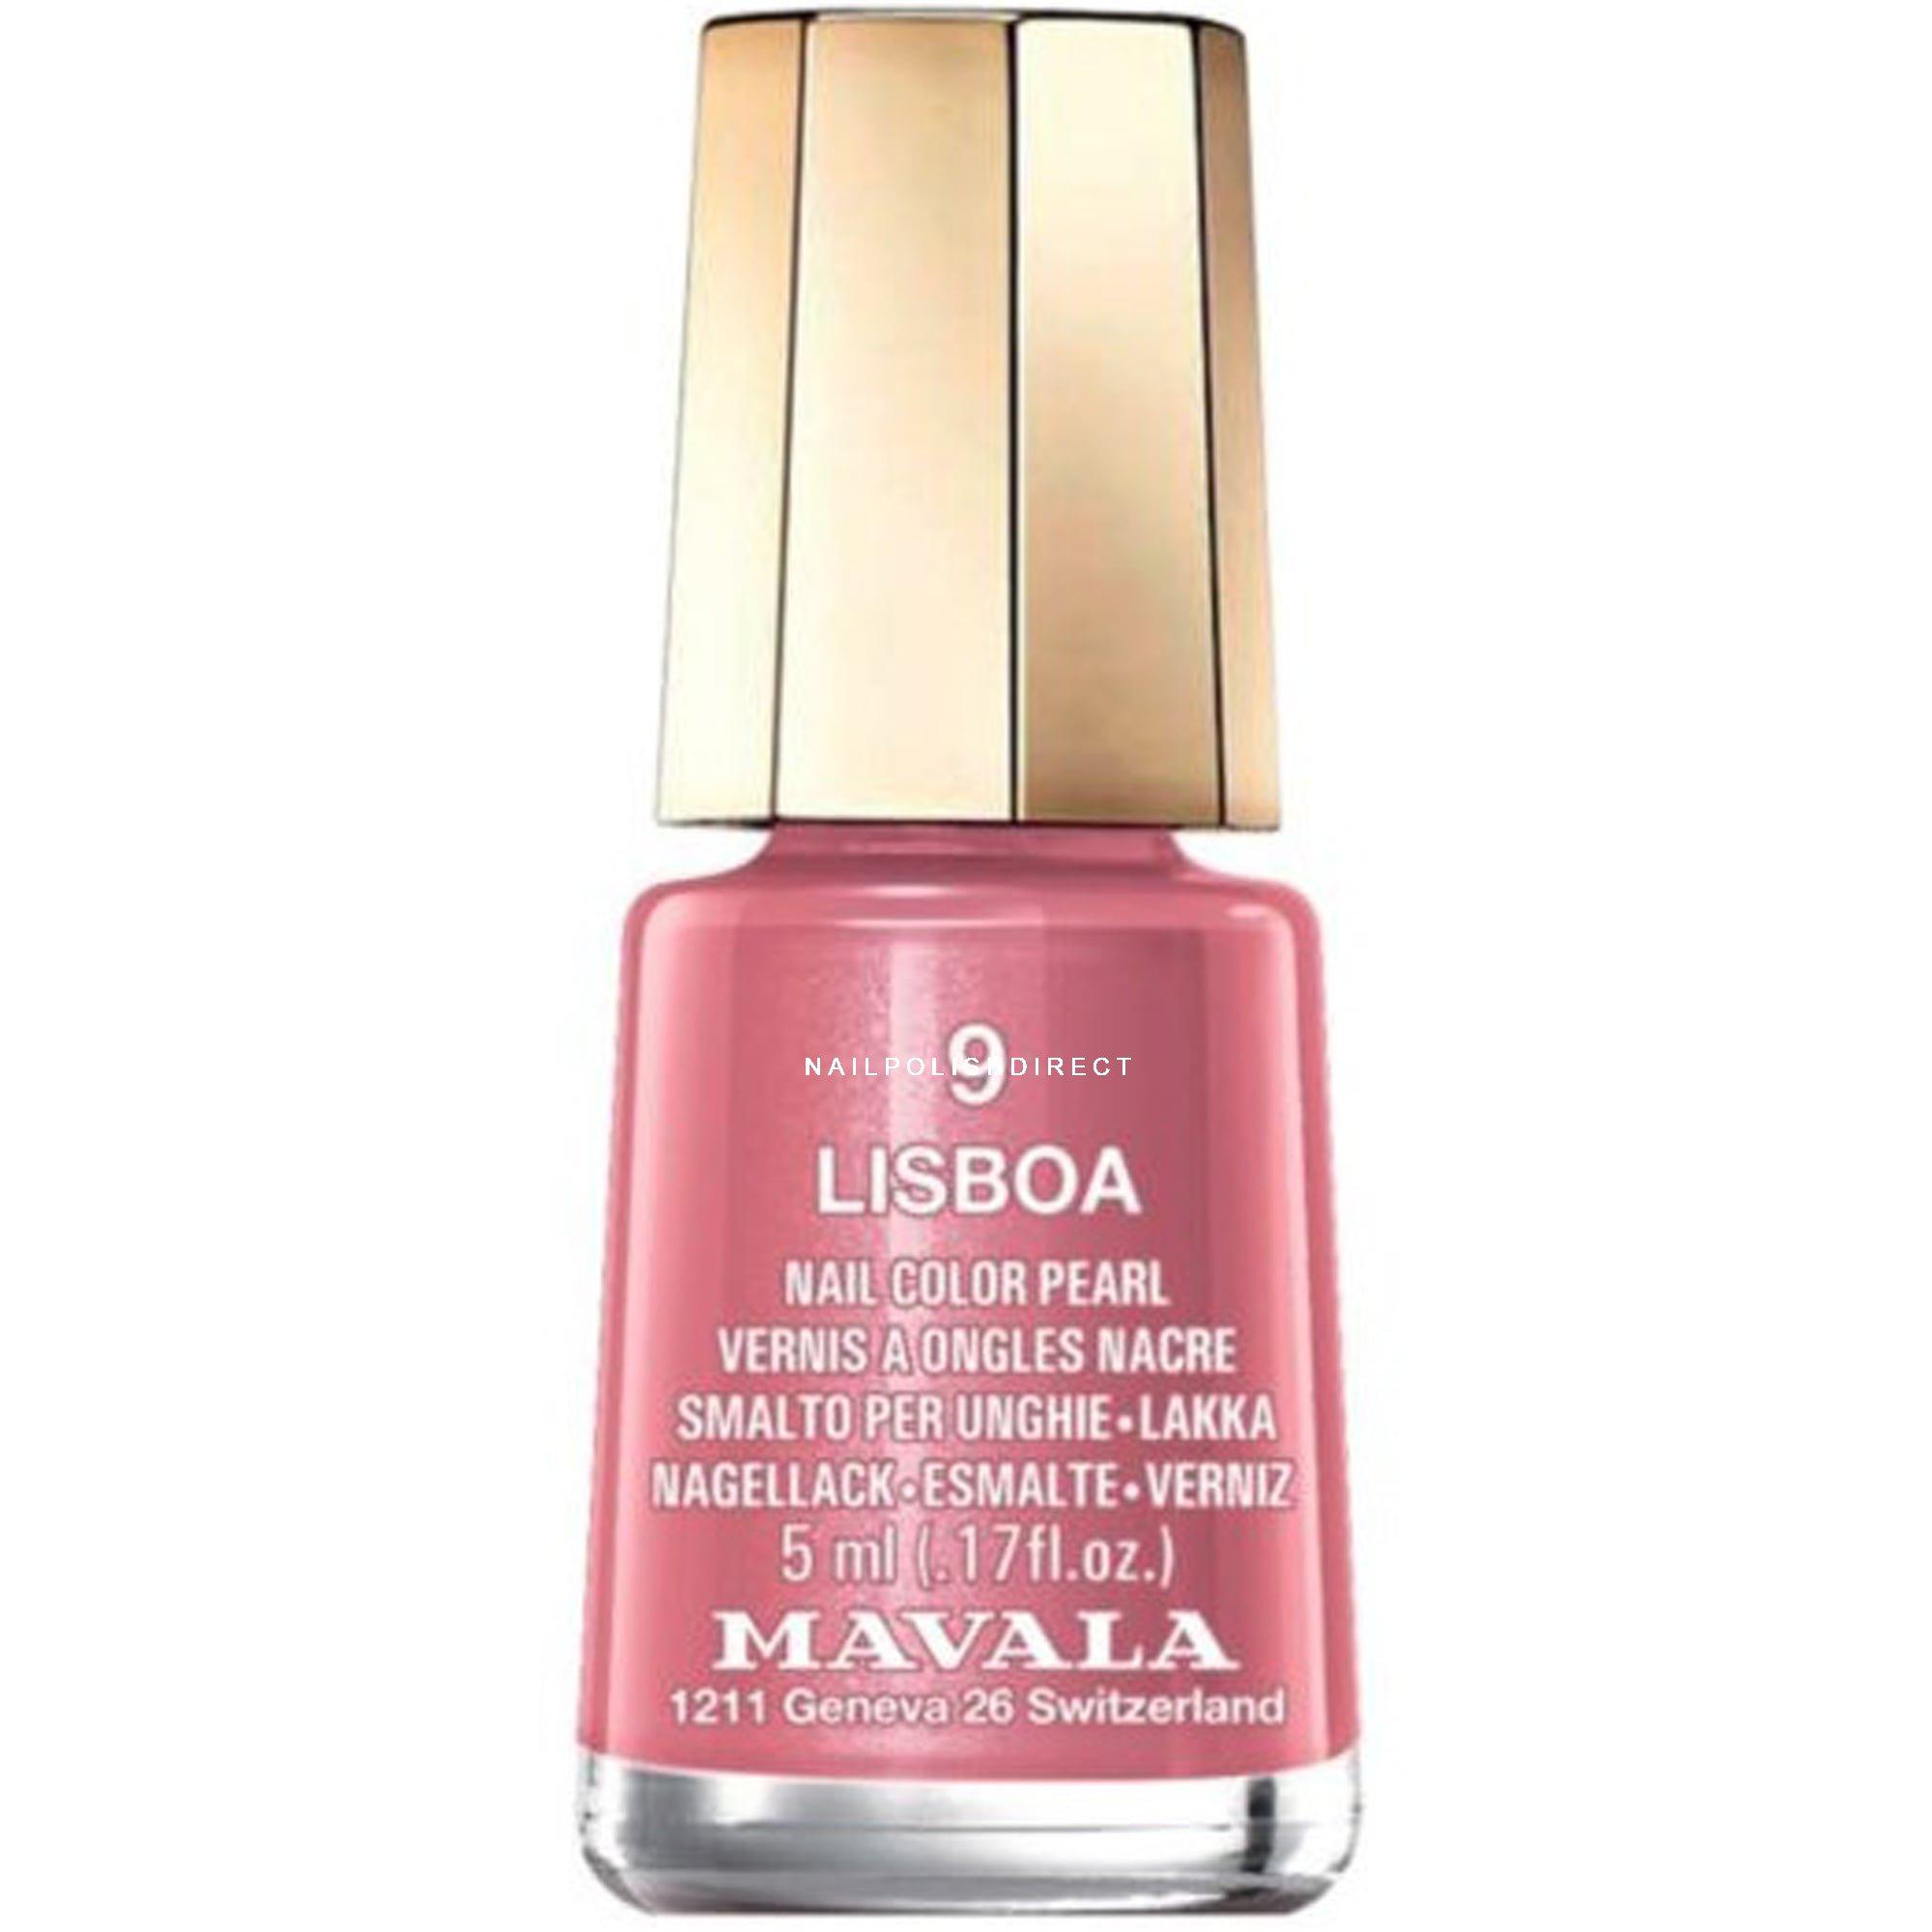 Mavala Mini Nail Color Pearl Nail Polish - Lisboa (9) 5ml